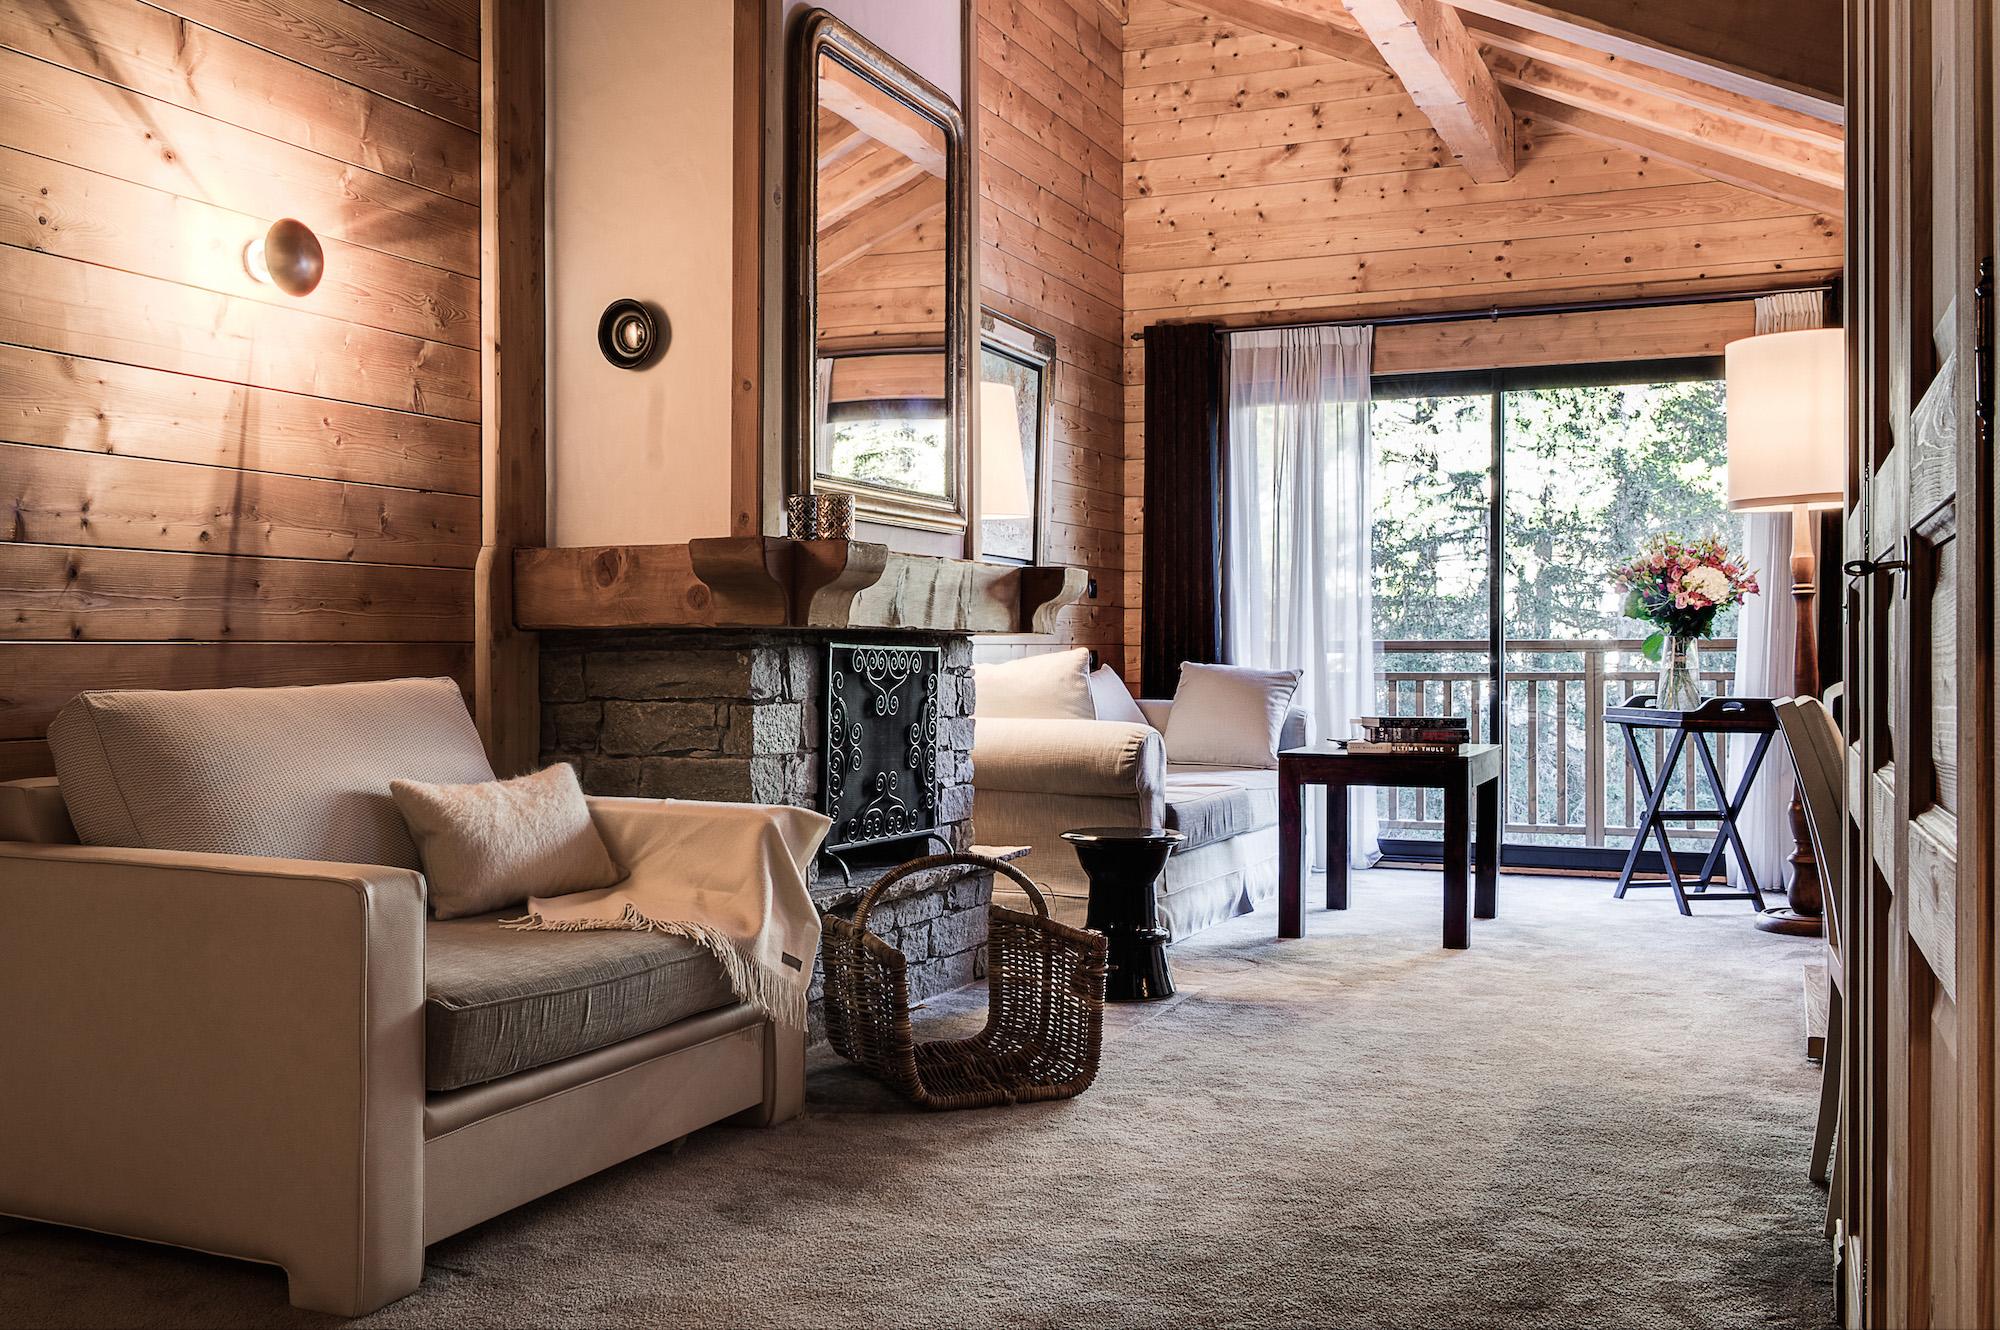 suite-prestige-hotel-la-sivoliere-ambiance-chalet